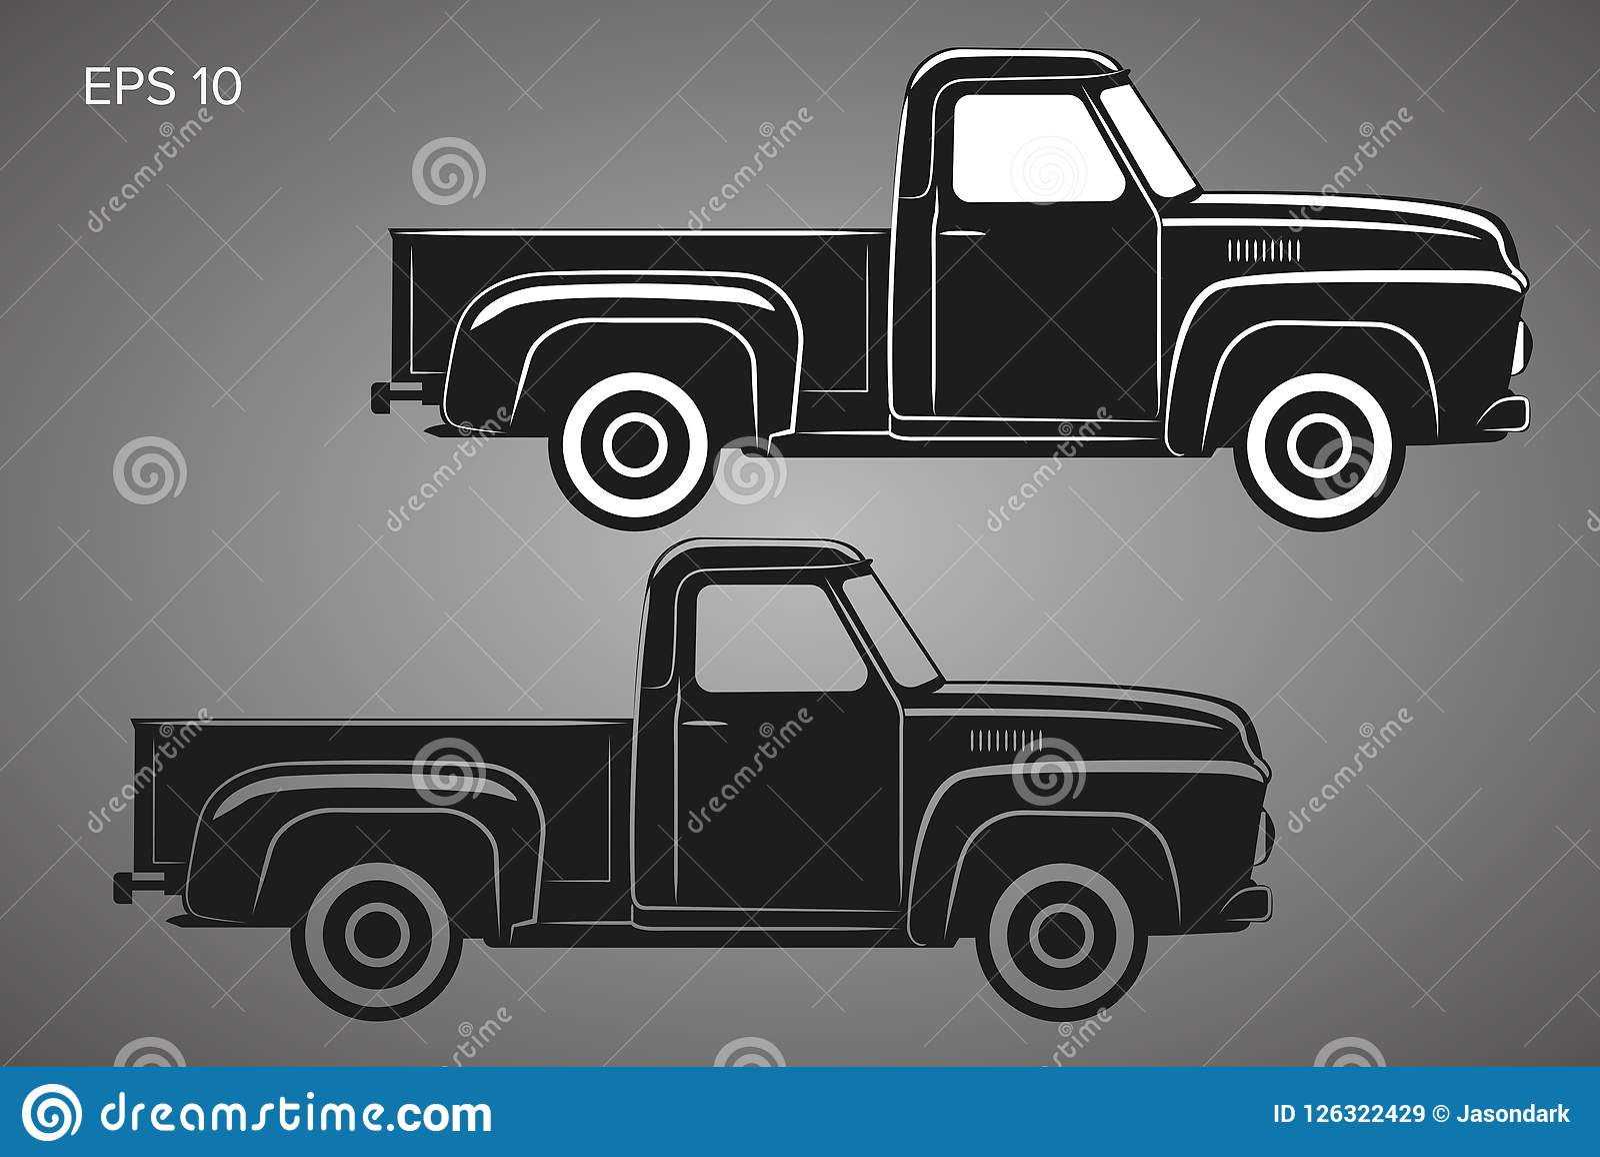 Old Retro Pickup Truck Vector Illustration  Vintage